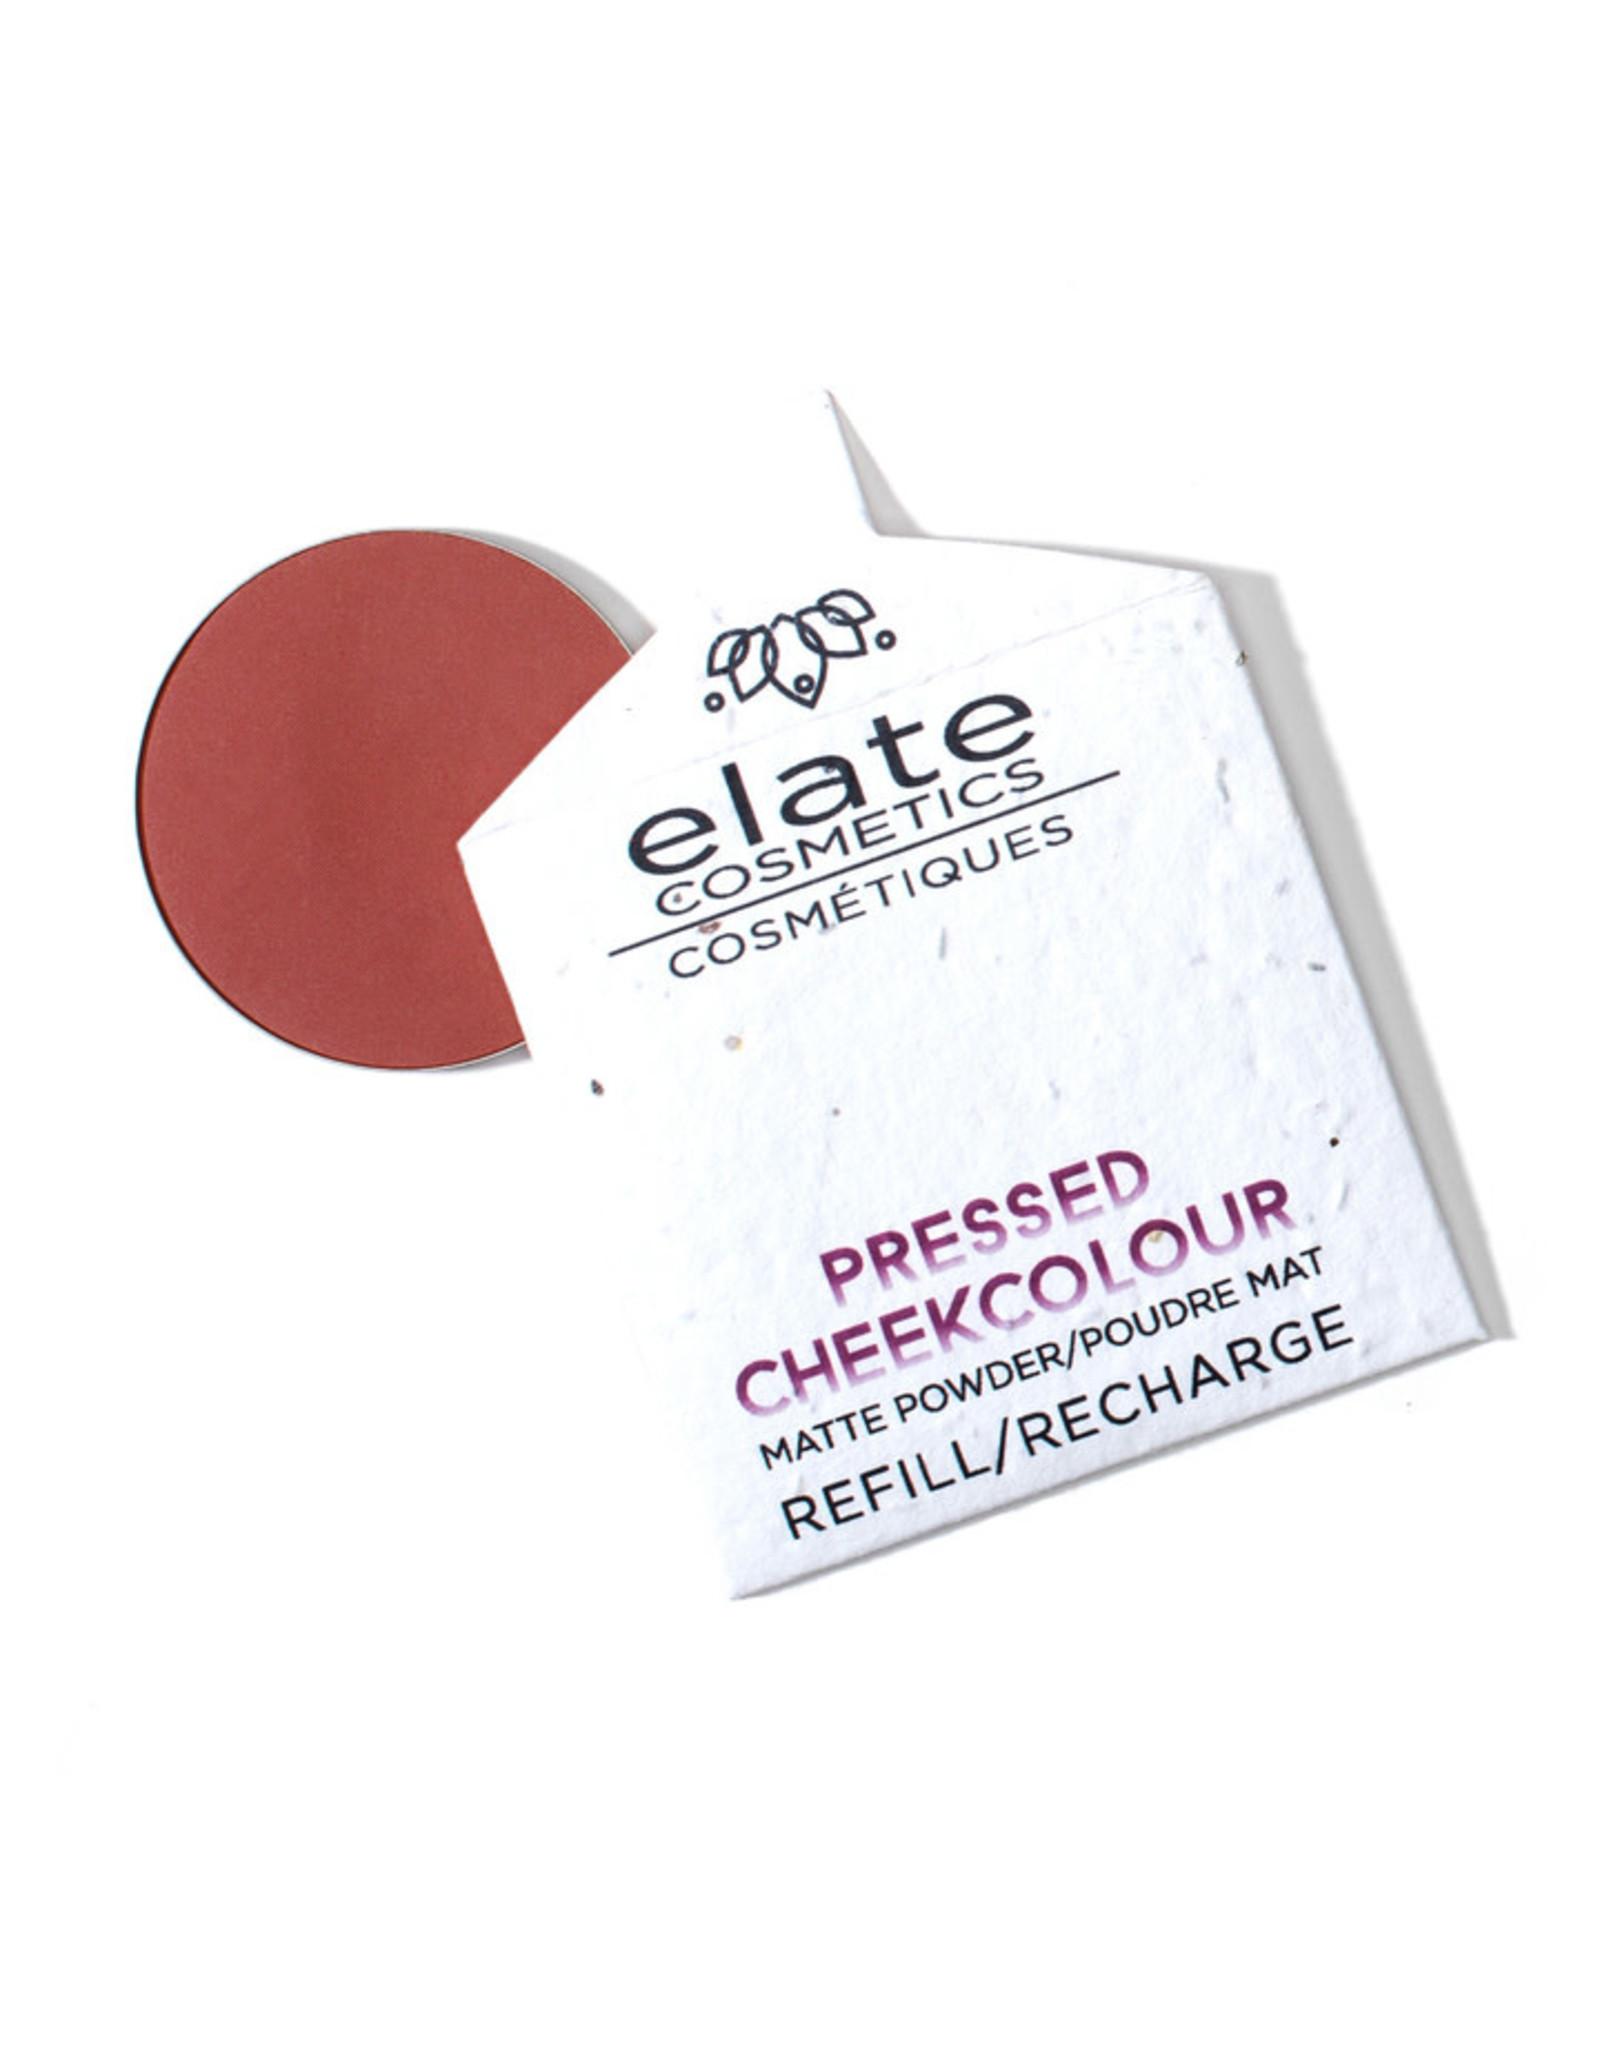 Elate Cosmetics Elate Pressed Cheek Colour - Triumph (refill)